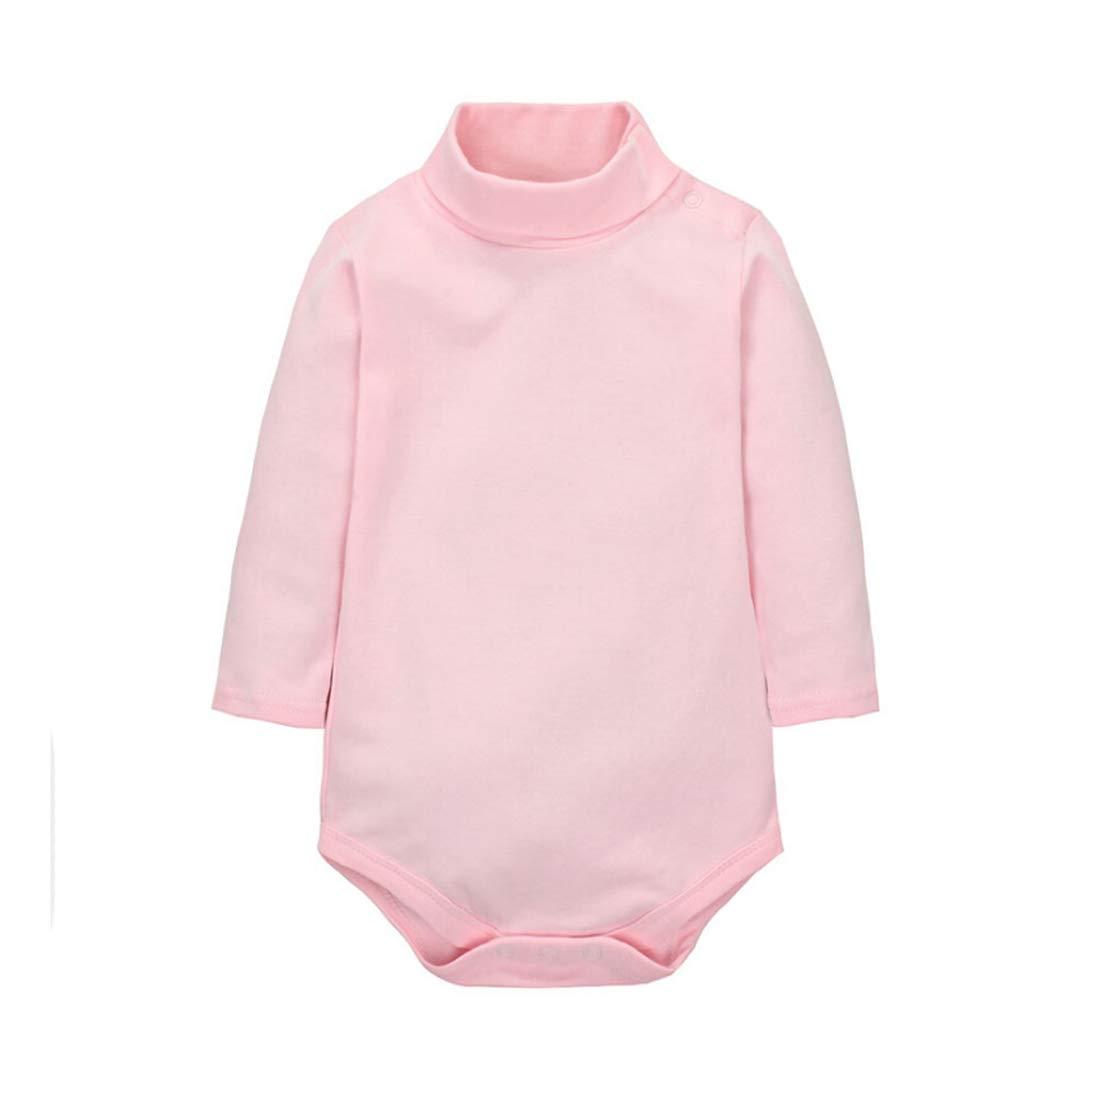 CuteOn Baby Boys Girls Solid Color Basic Turtleneck Cotton Bodysuit Jumpsuit Pink 18 Months